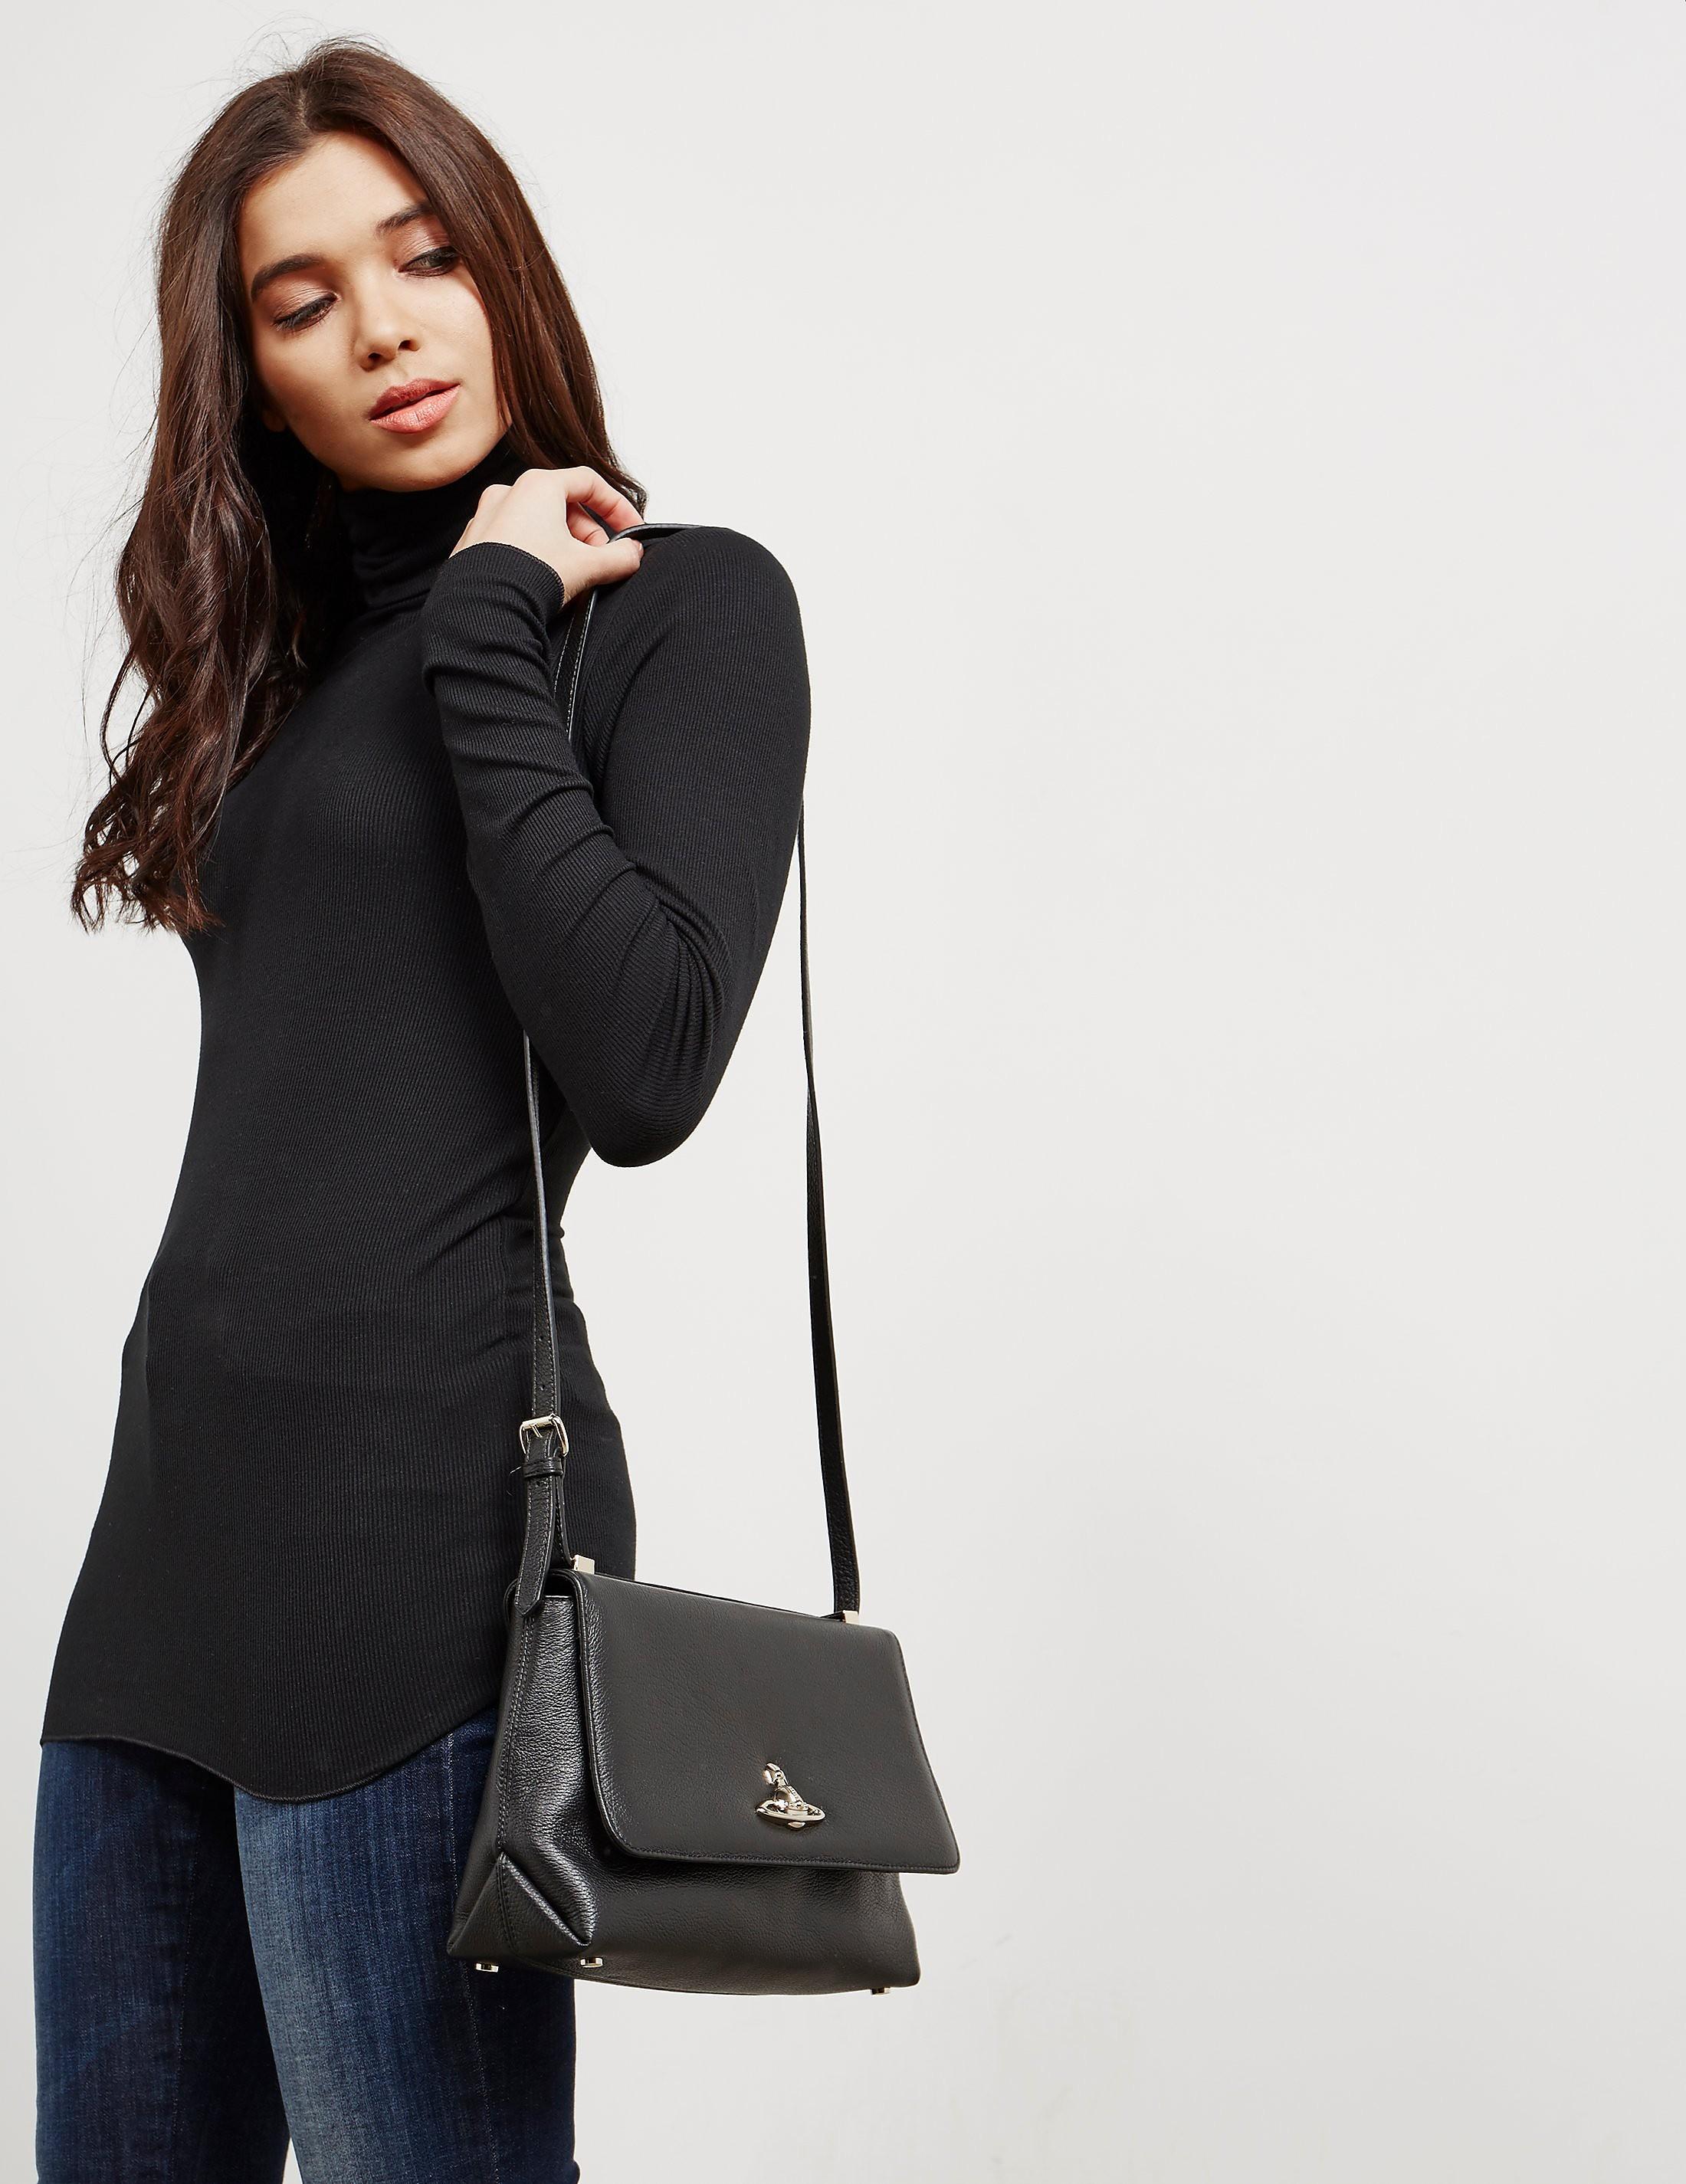 Vivienne Westwood Balmoral Crossbody Bag - Online Exclusive